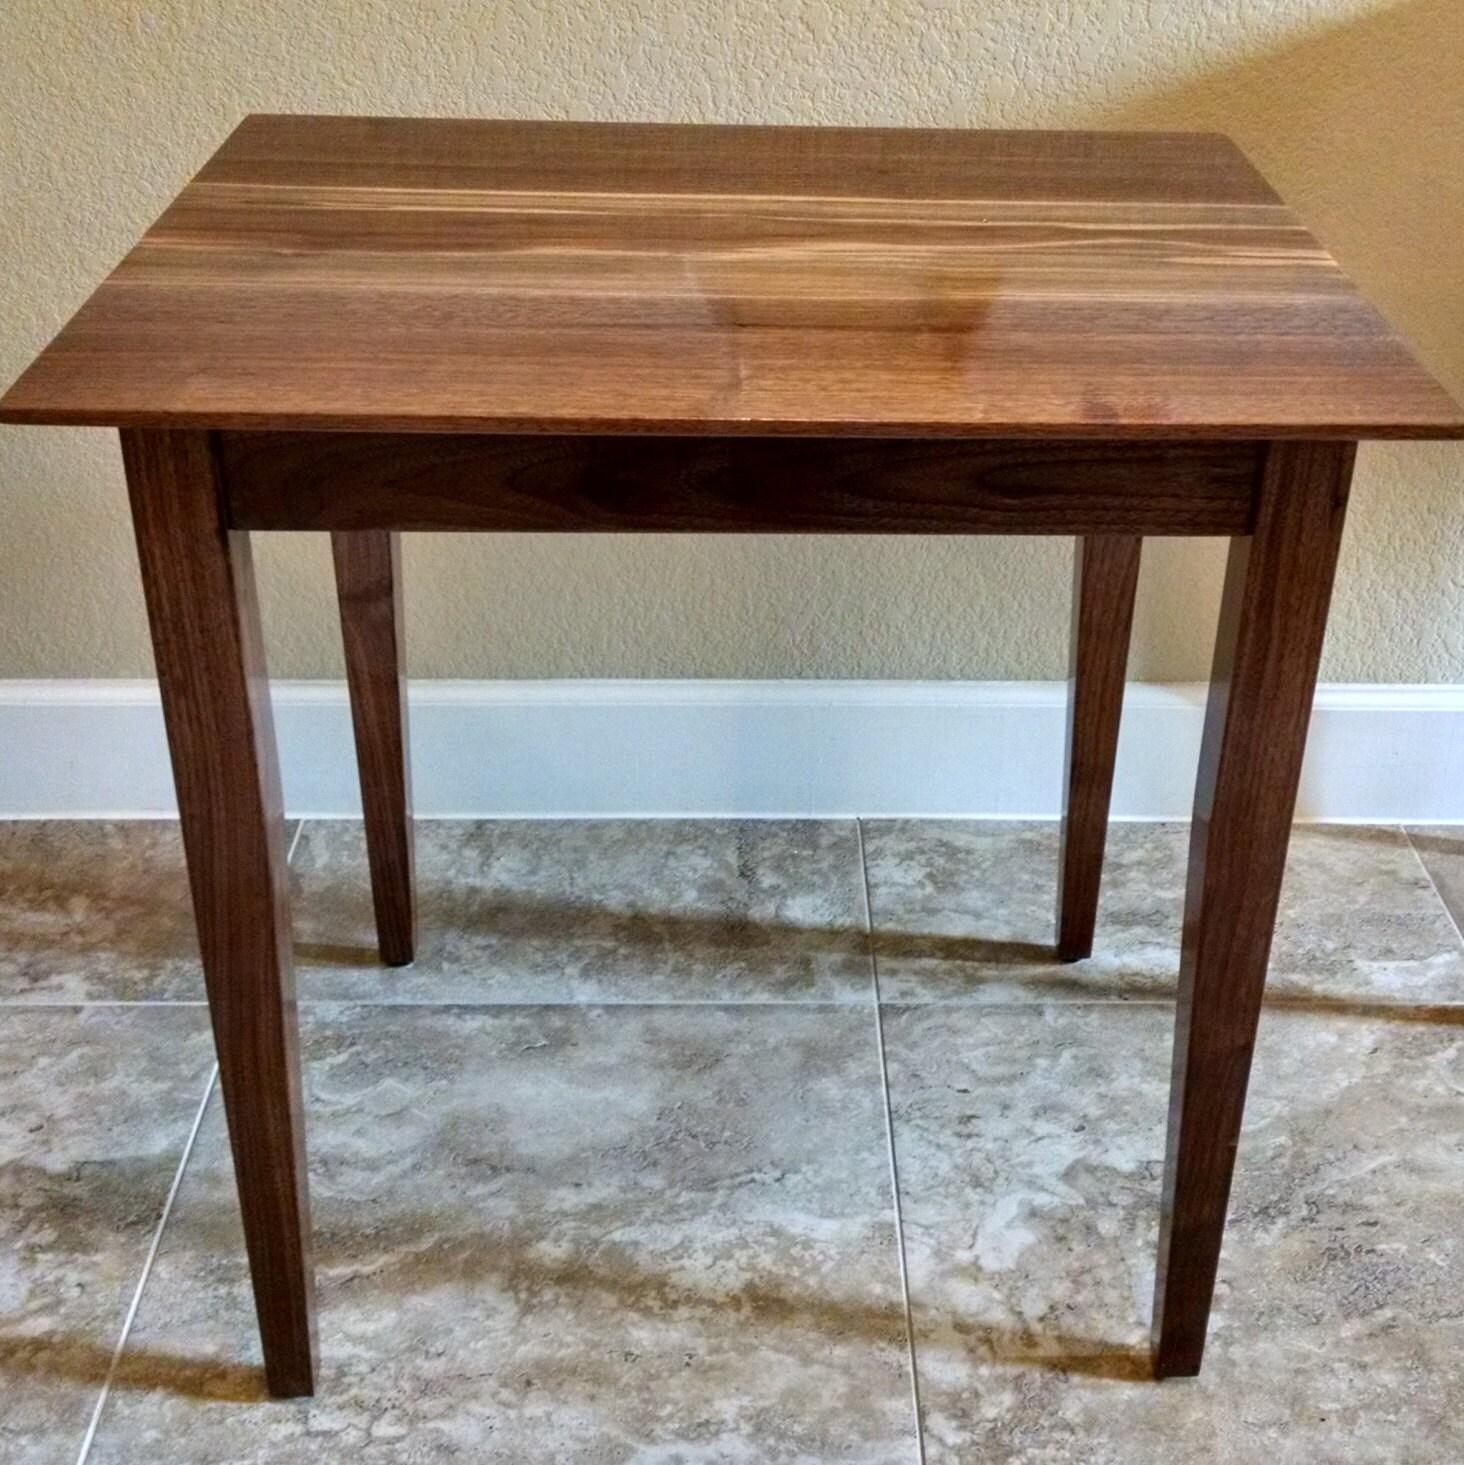 Rustic Foyer Jr : Sale side or end table solid black walnut wood coffee